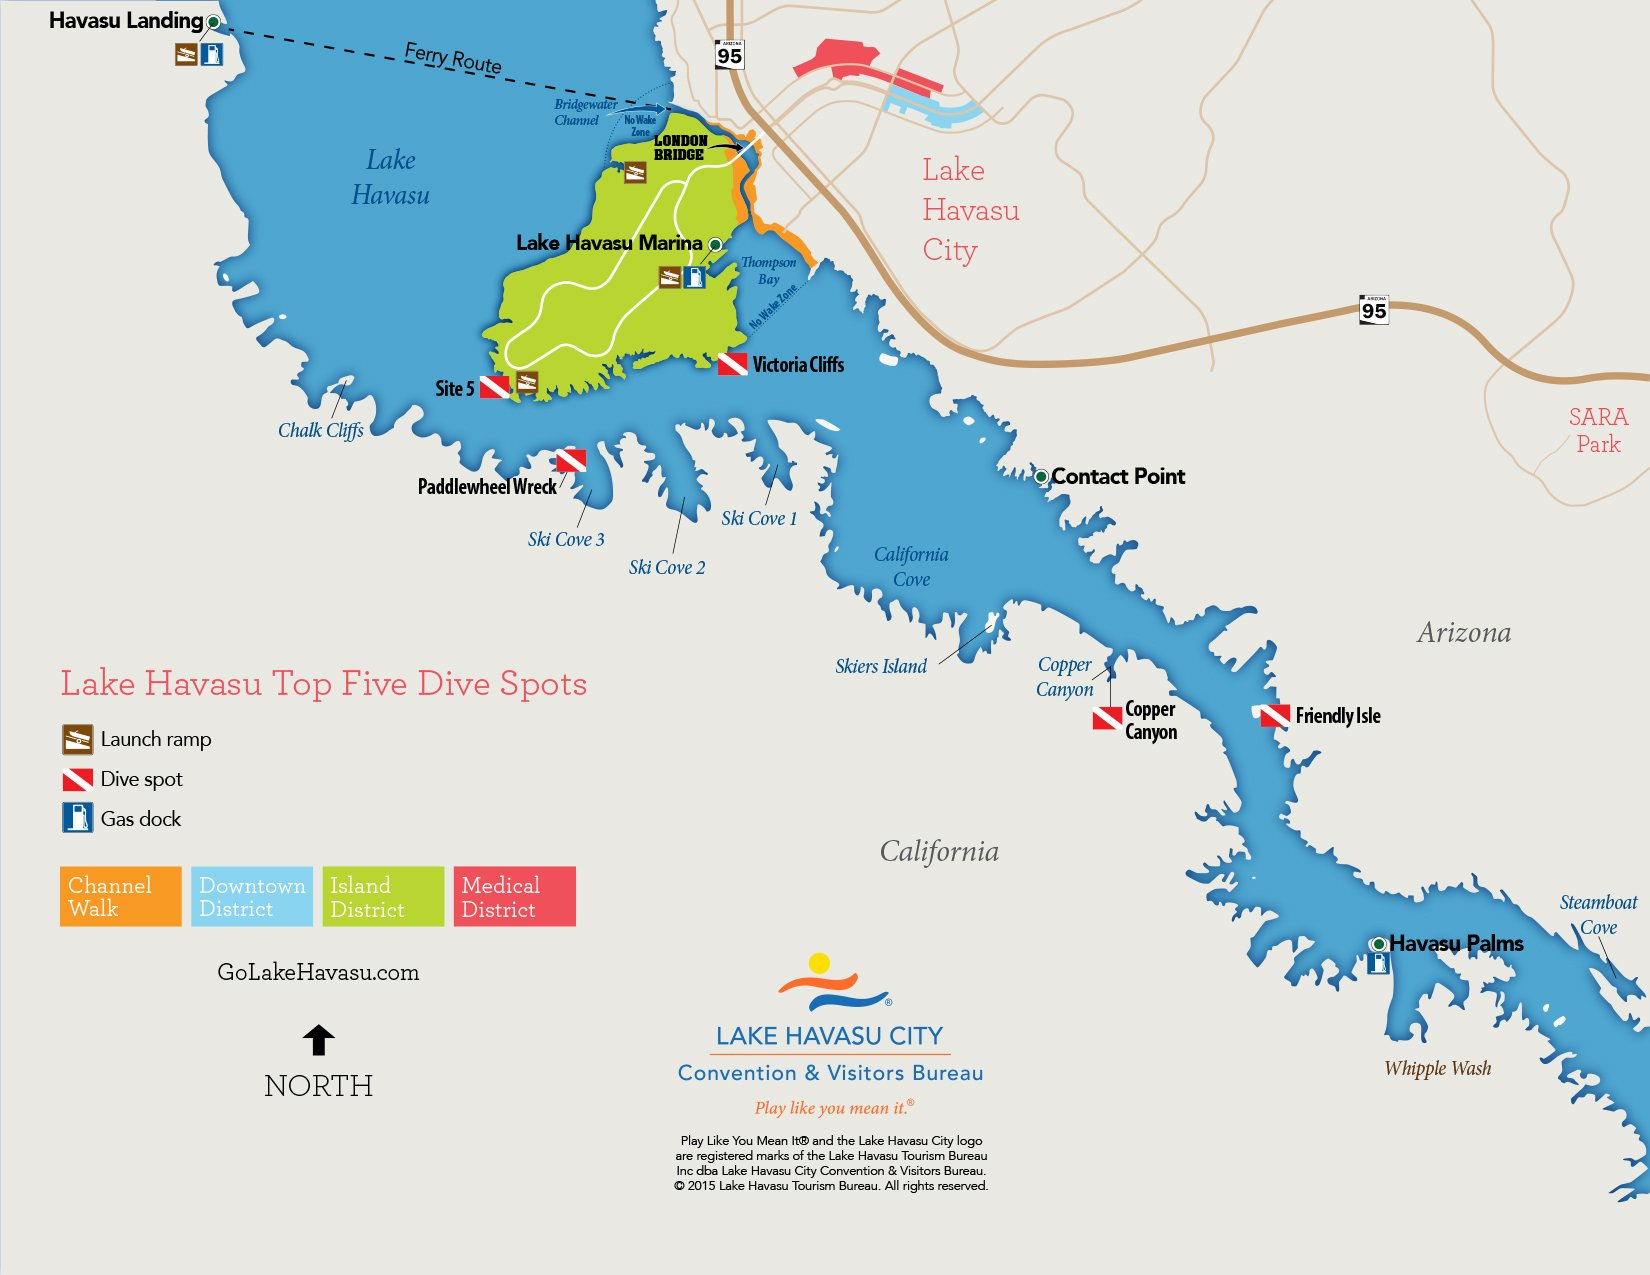 Map Downloads - Lake Havasu City on